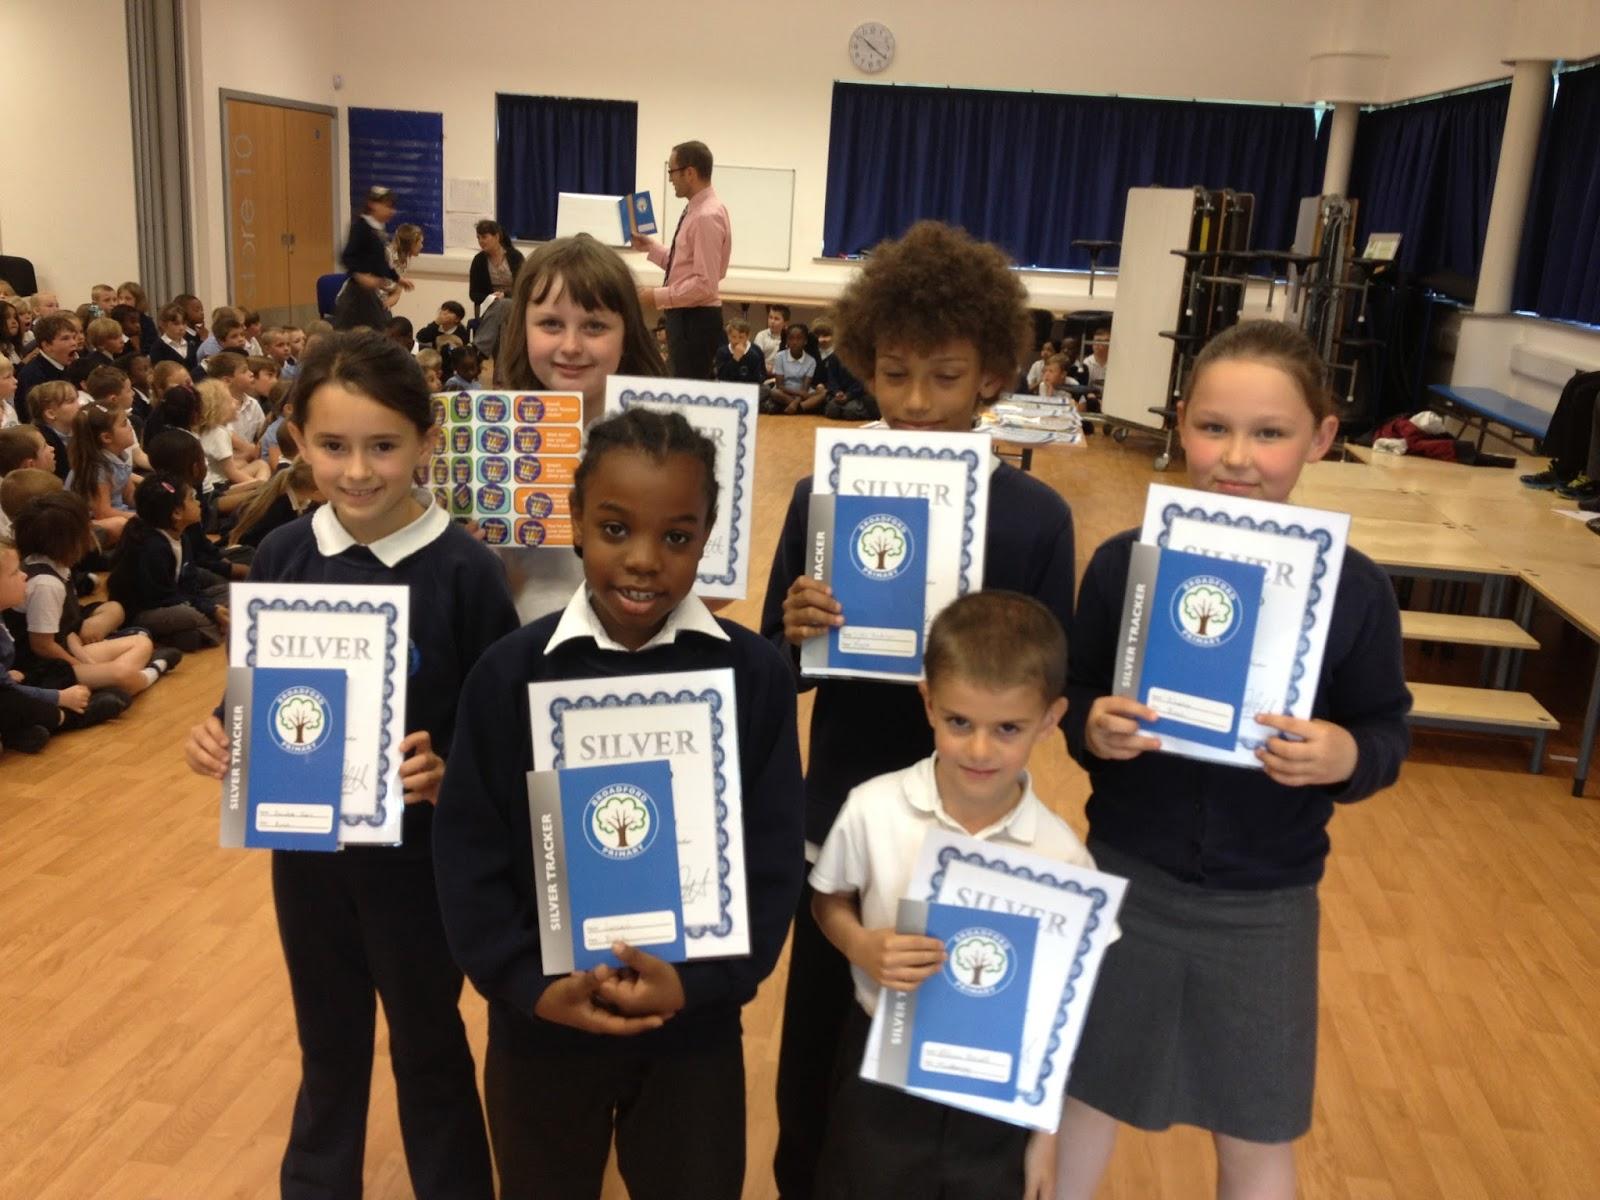 Broadford Primary June 2013